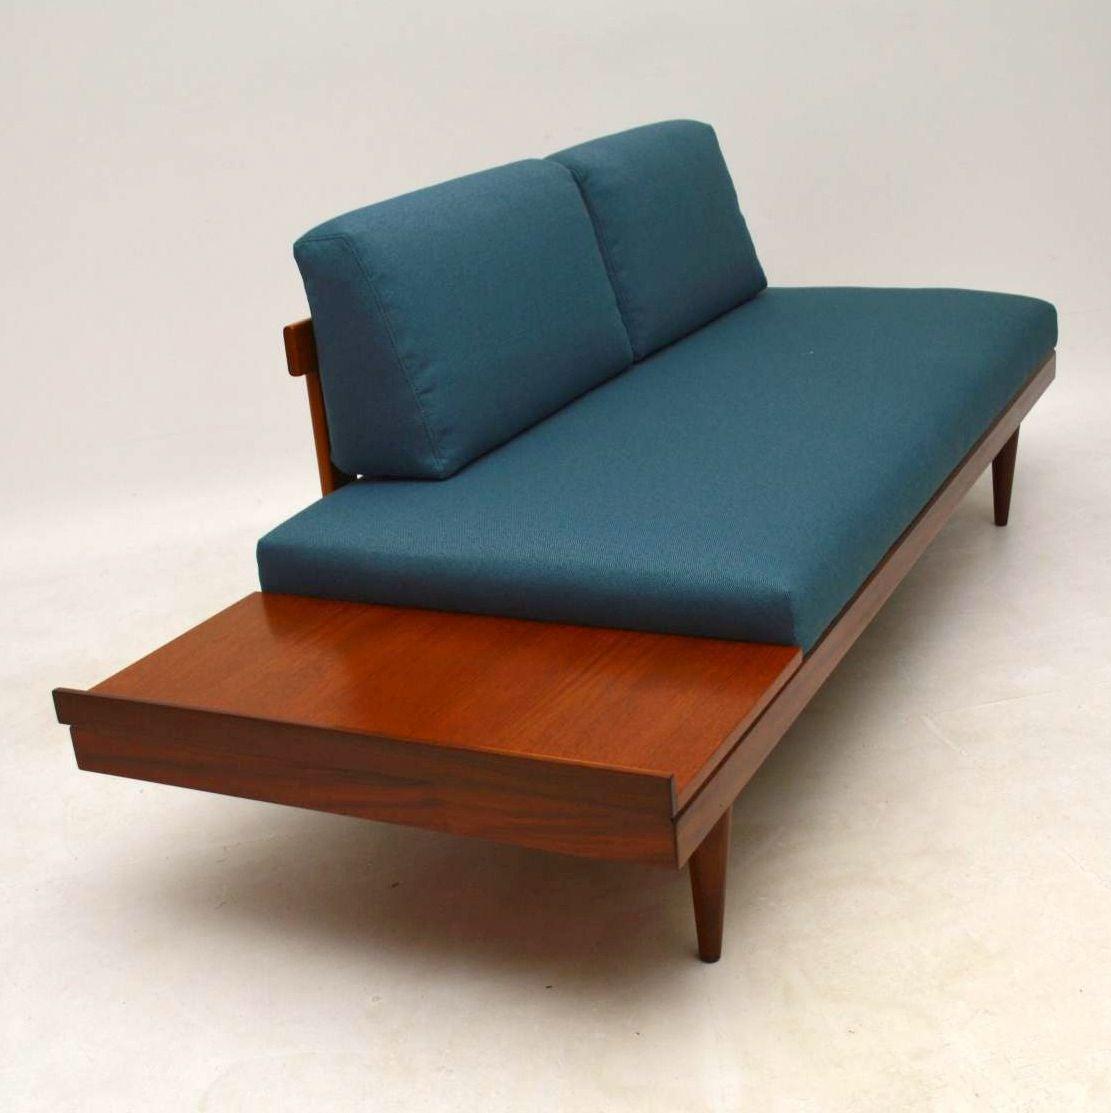 Lovely 1950s Vintage Teak Sofa Bed By Ingmar Relling At 1stdibs